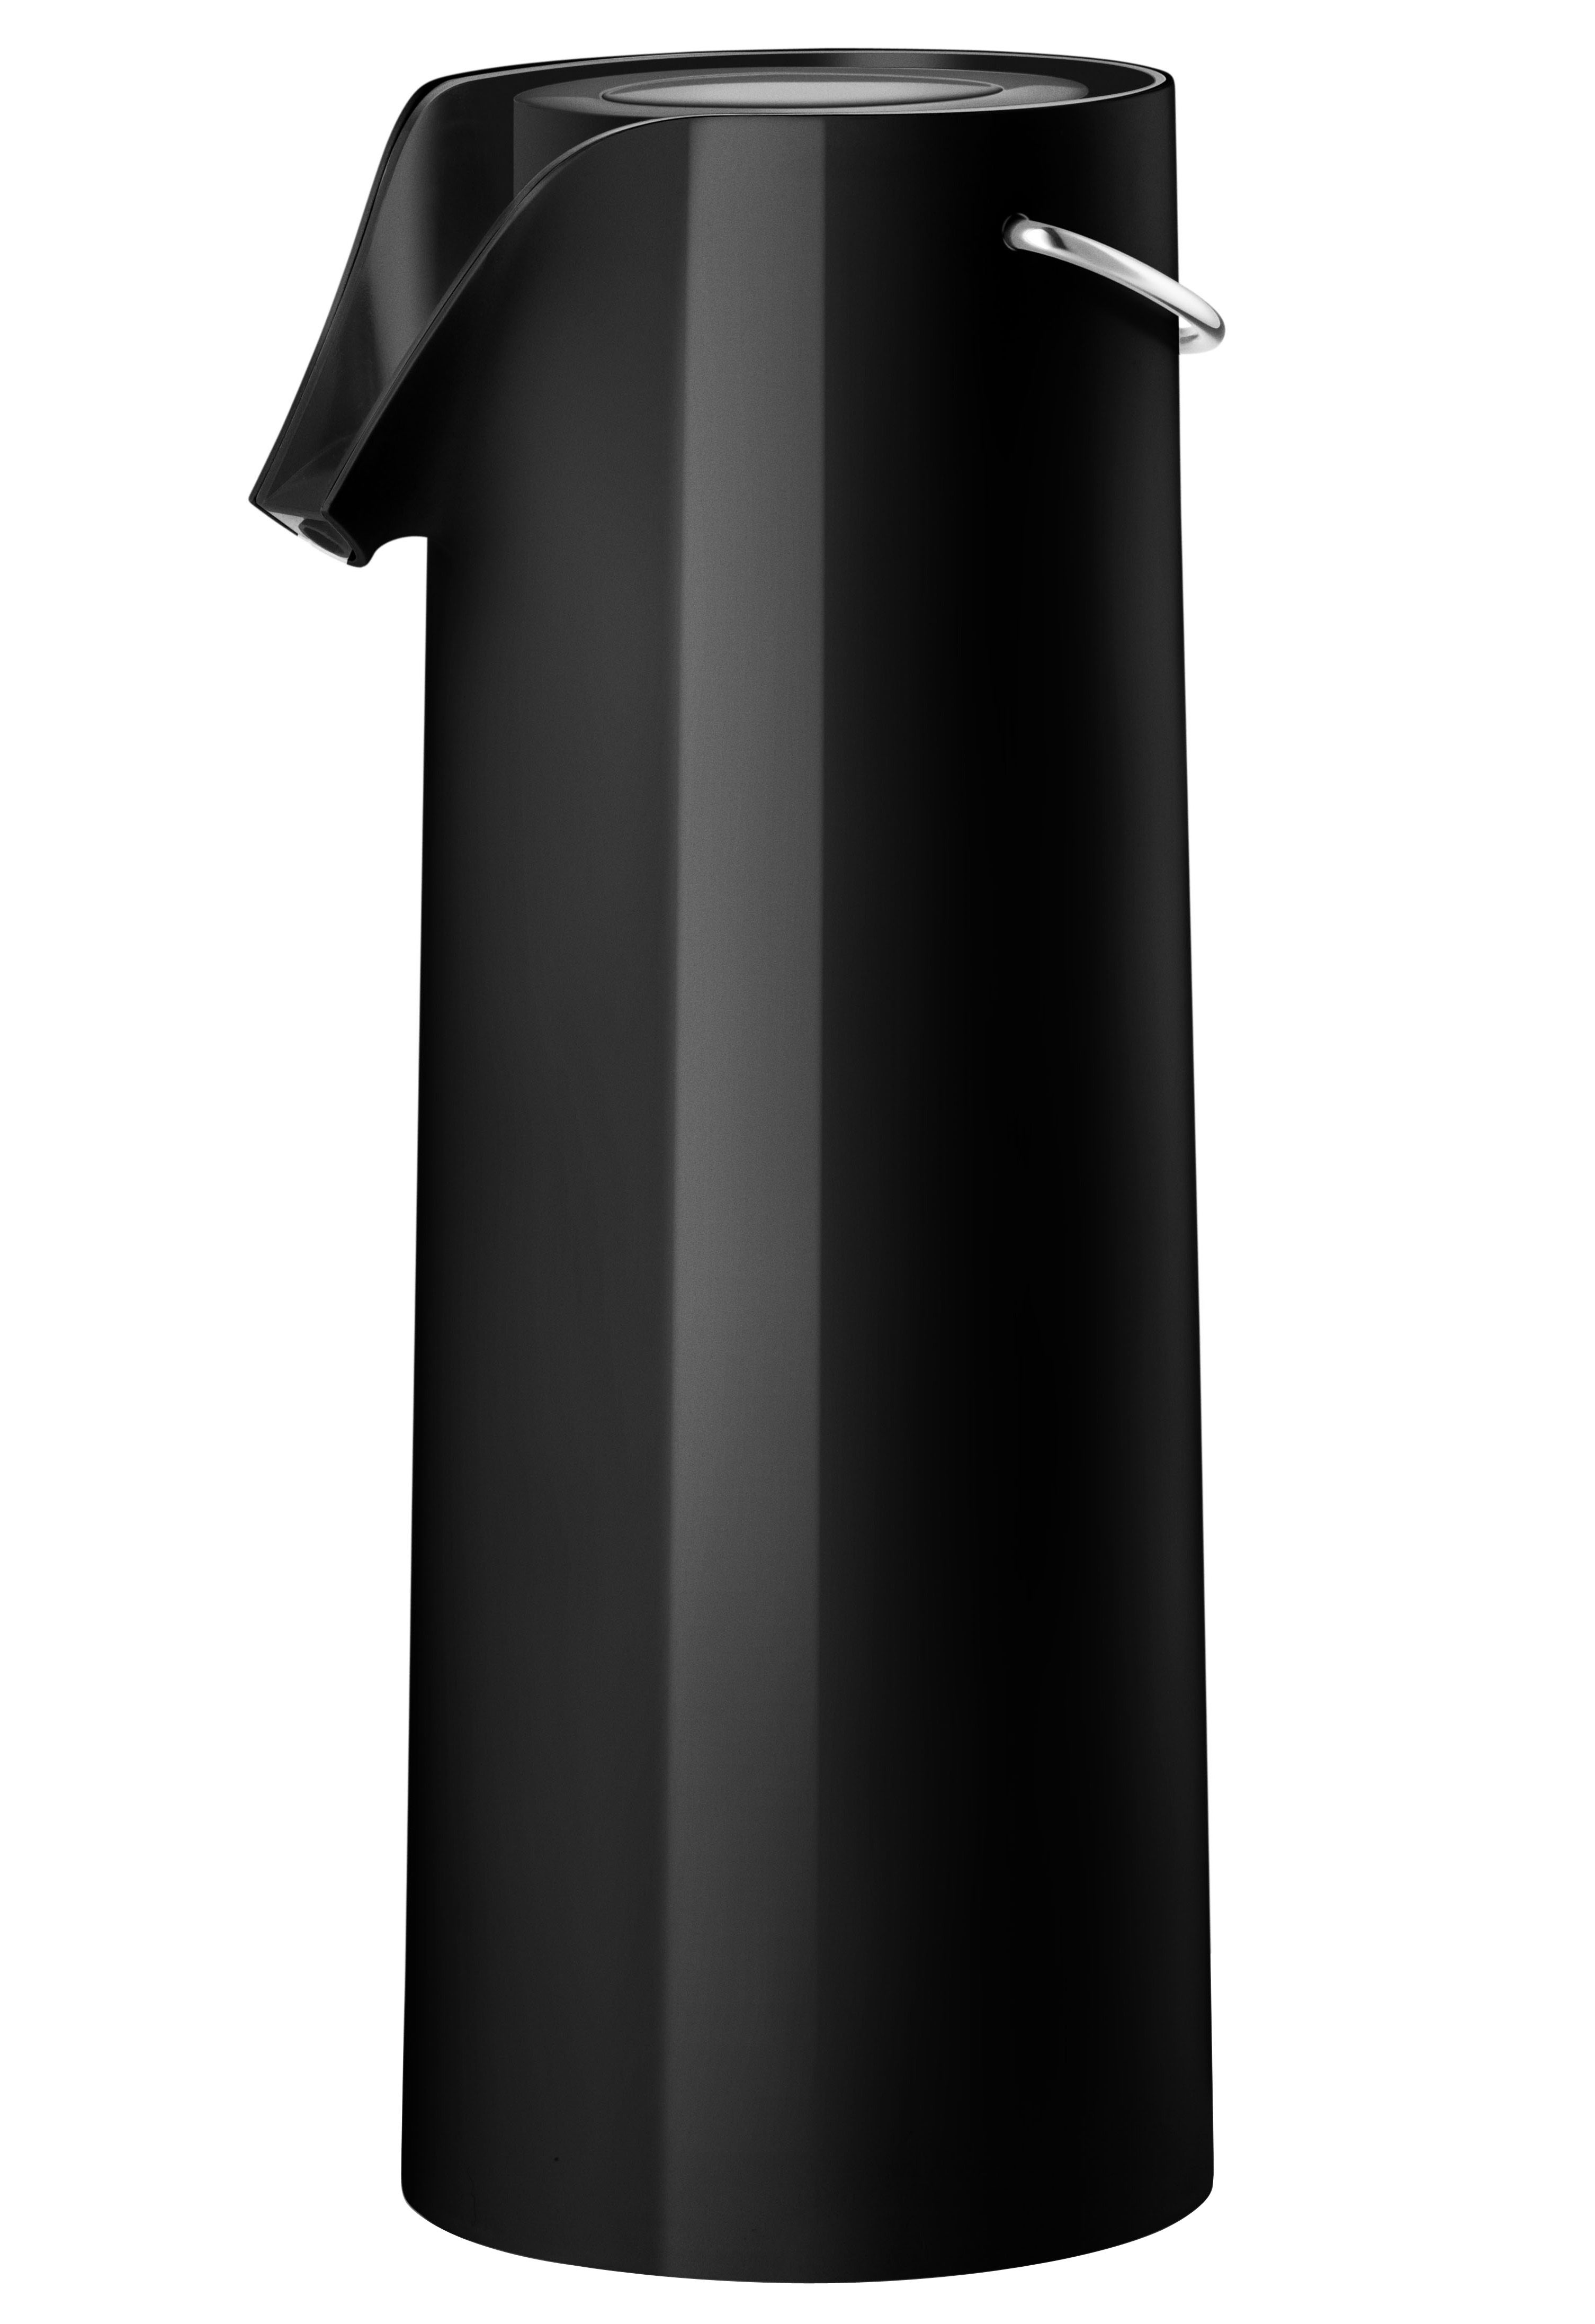 Tableware - Tea & Coffee Accessories - Insulated jug - Pump vacuum - 1.8L by Eva Solo - Black - ABS, Glass, Polypropylene